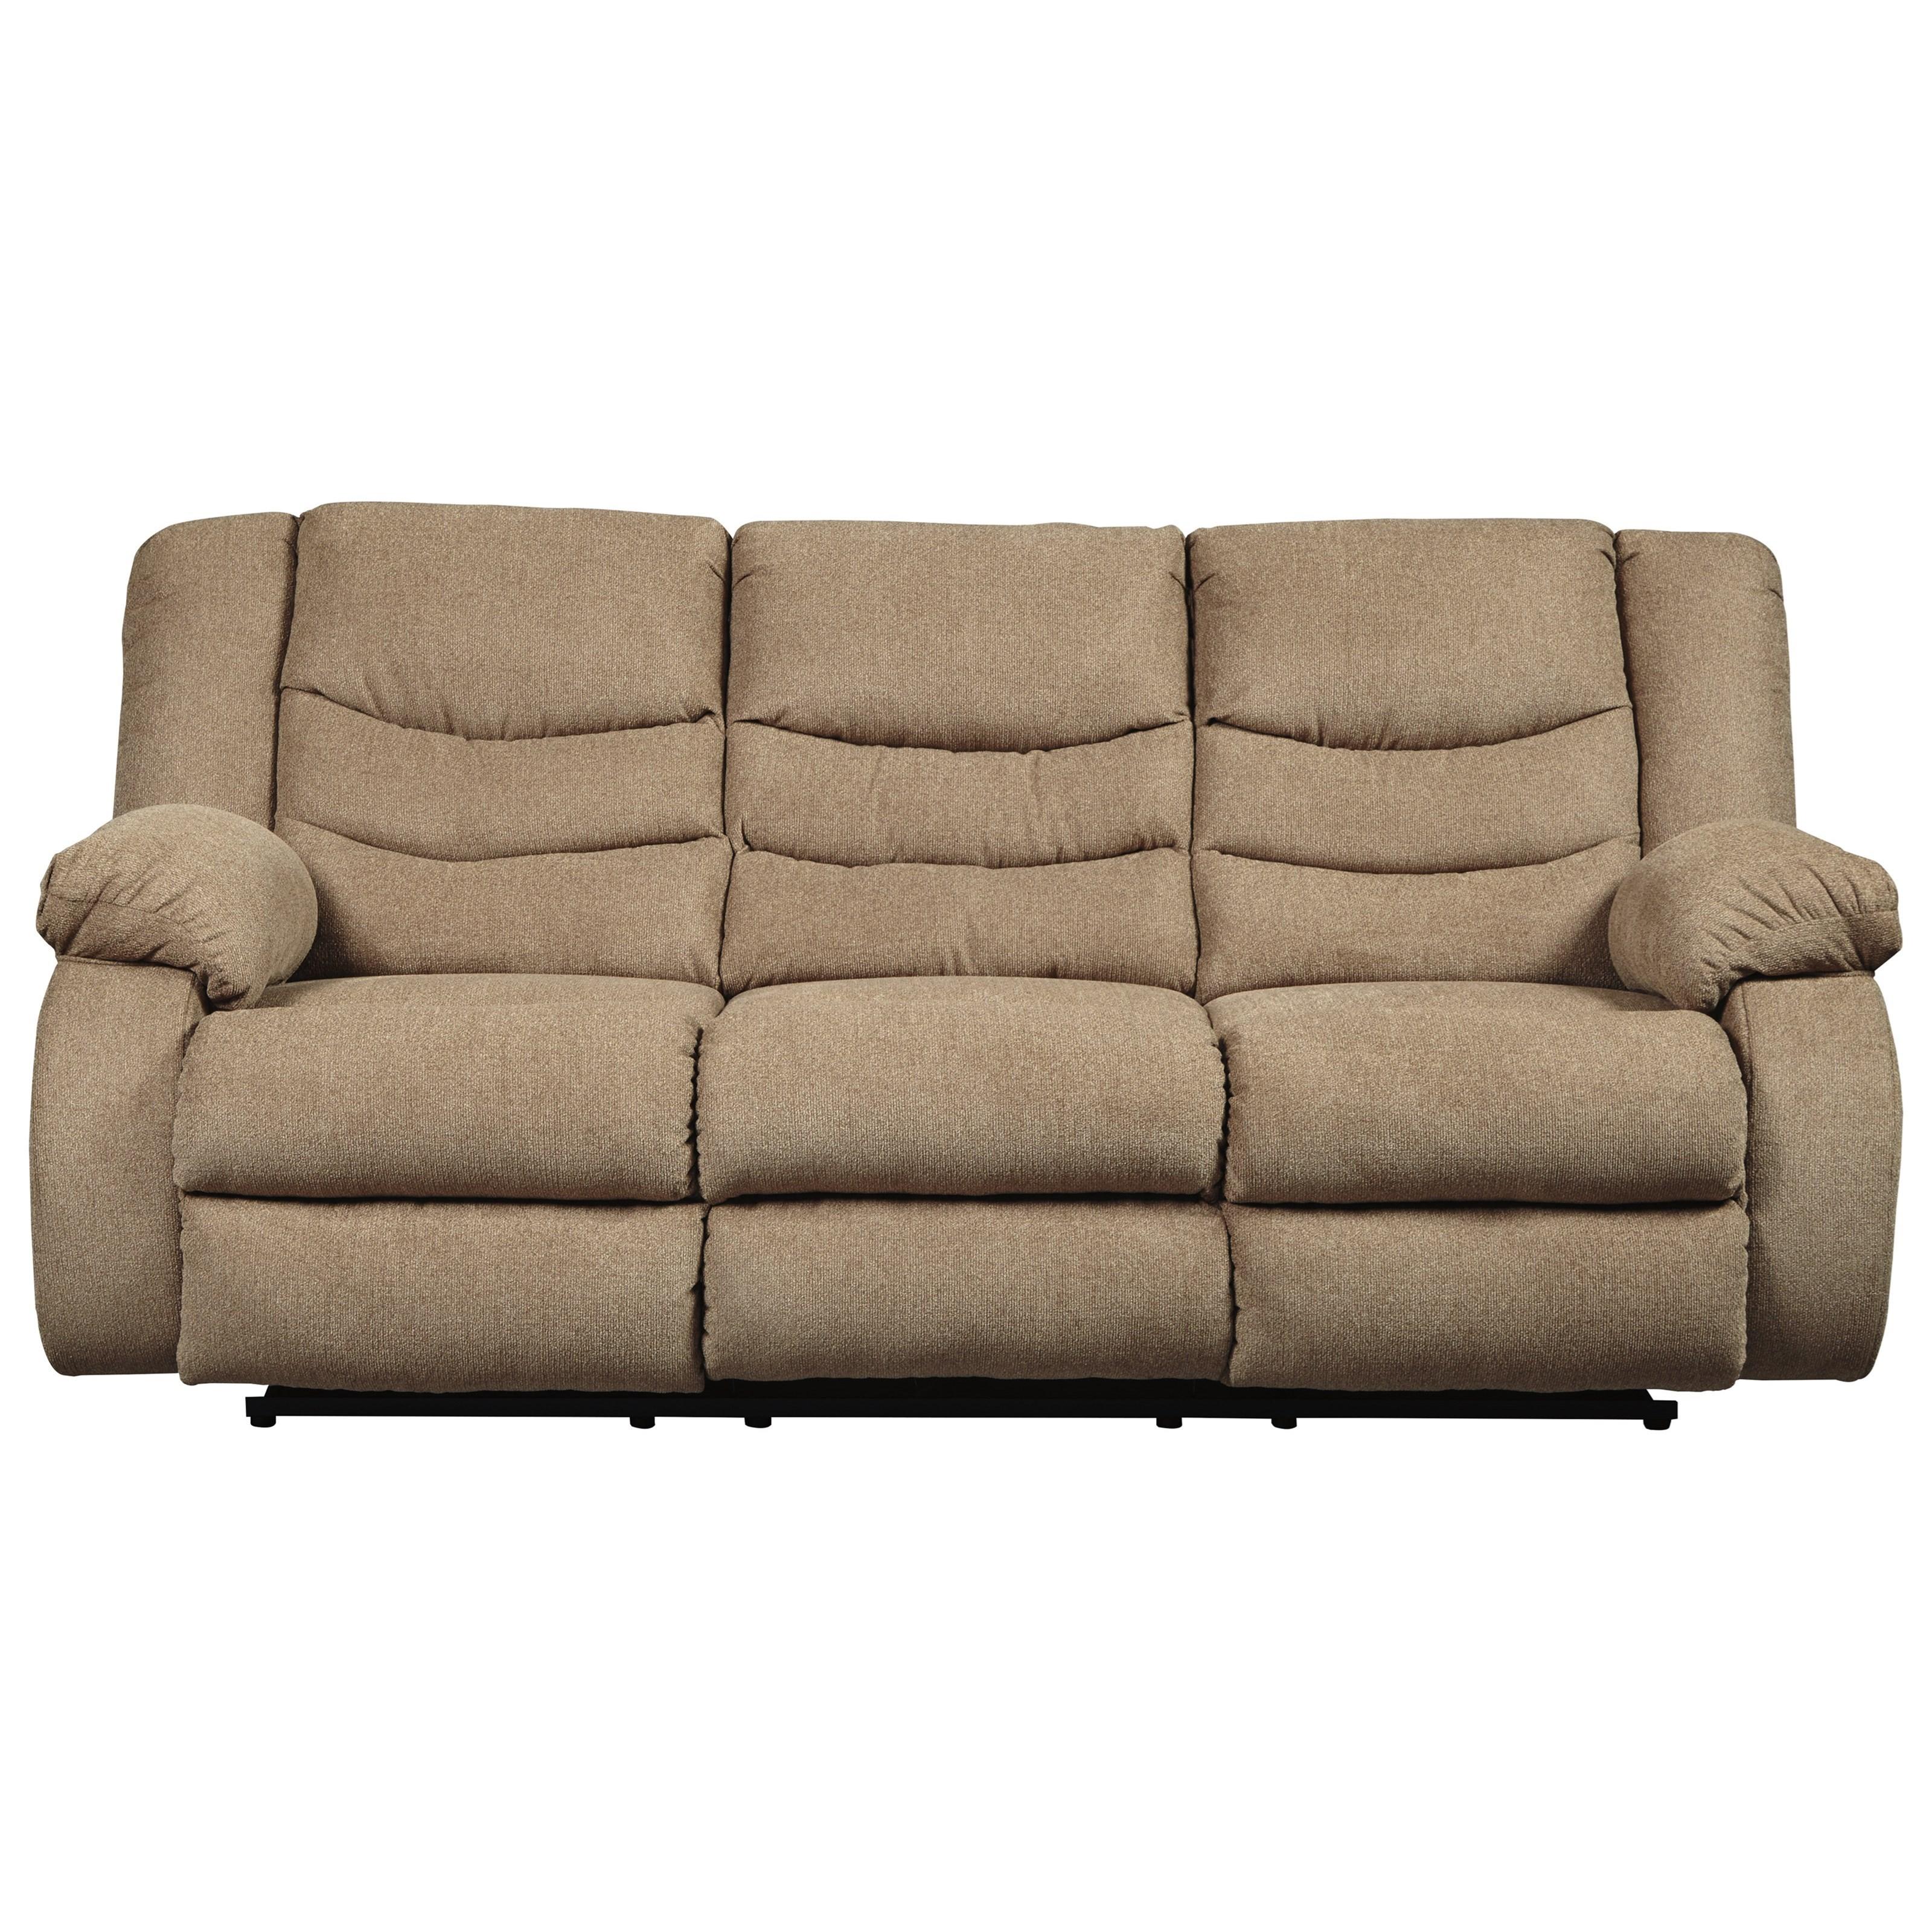 Signature design by ashley tulen 9860488 contemporary for Contemporary reclining sofas